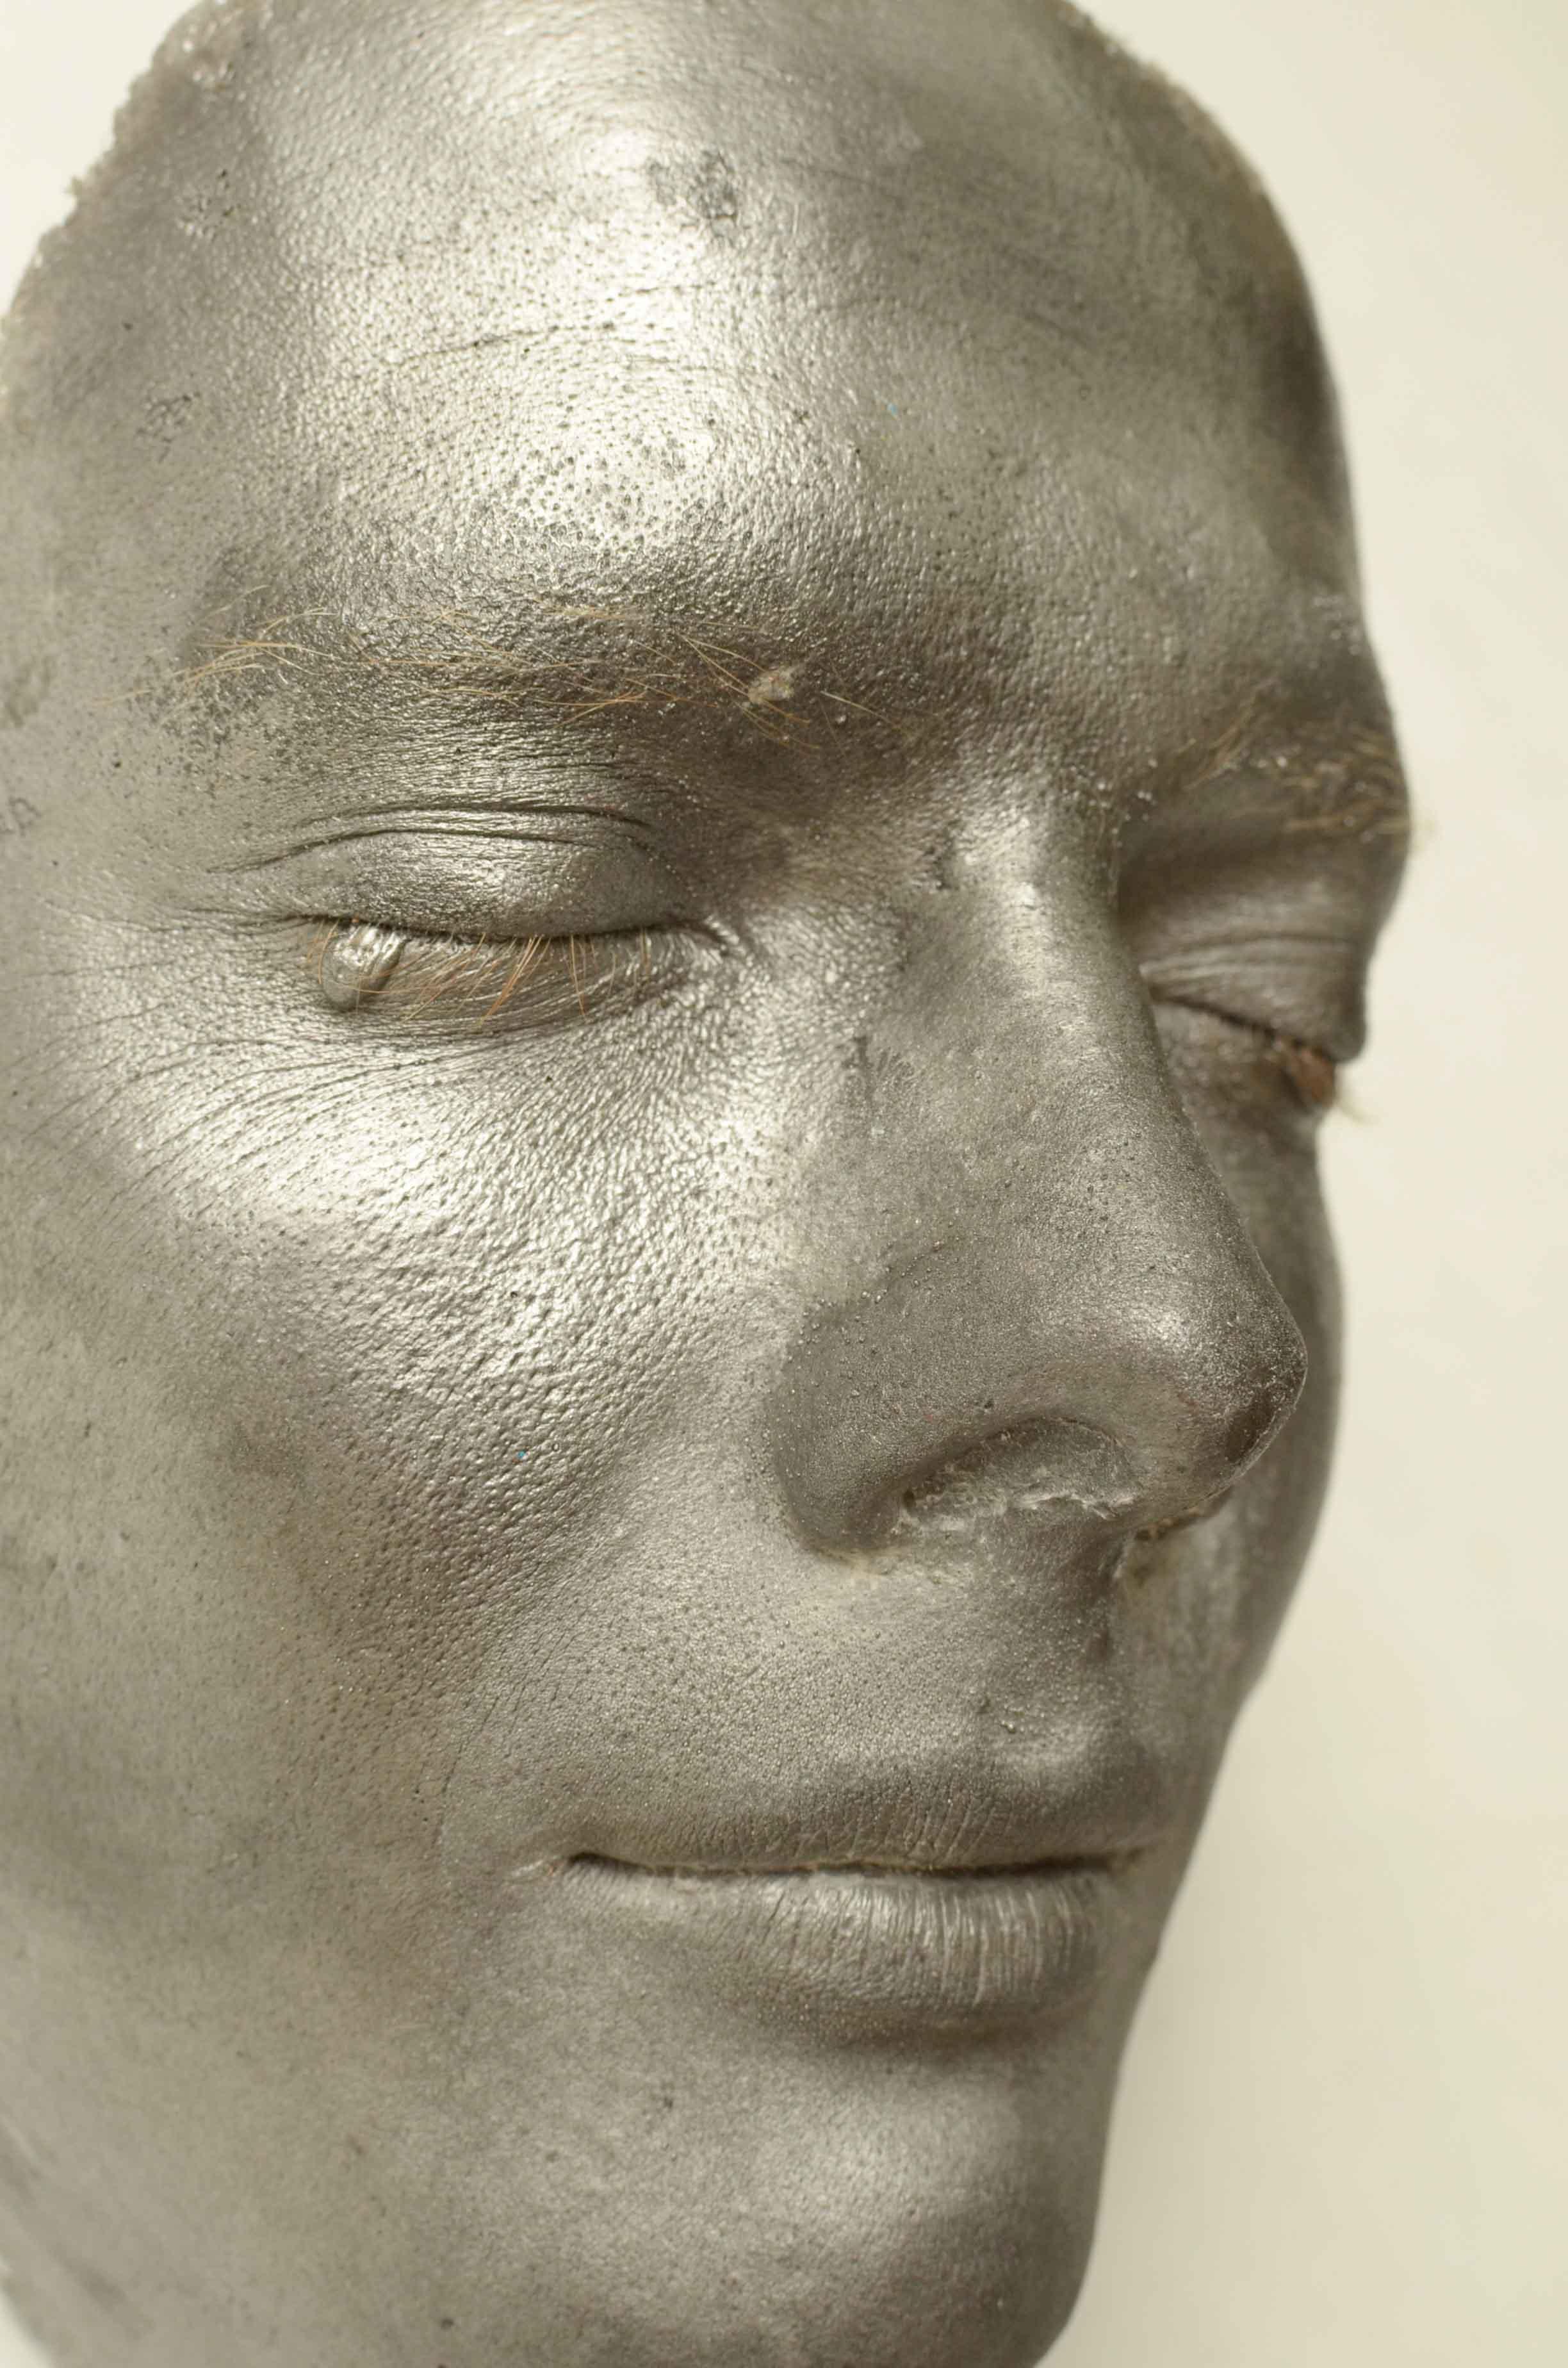 Side profile of face cast